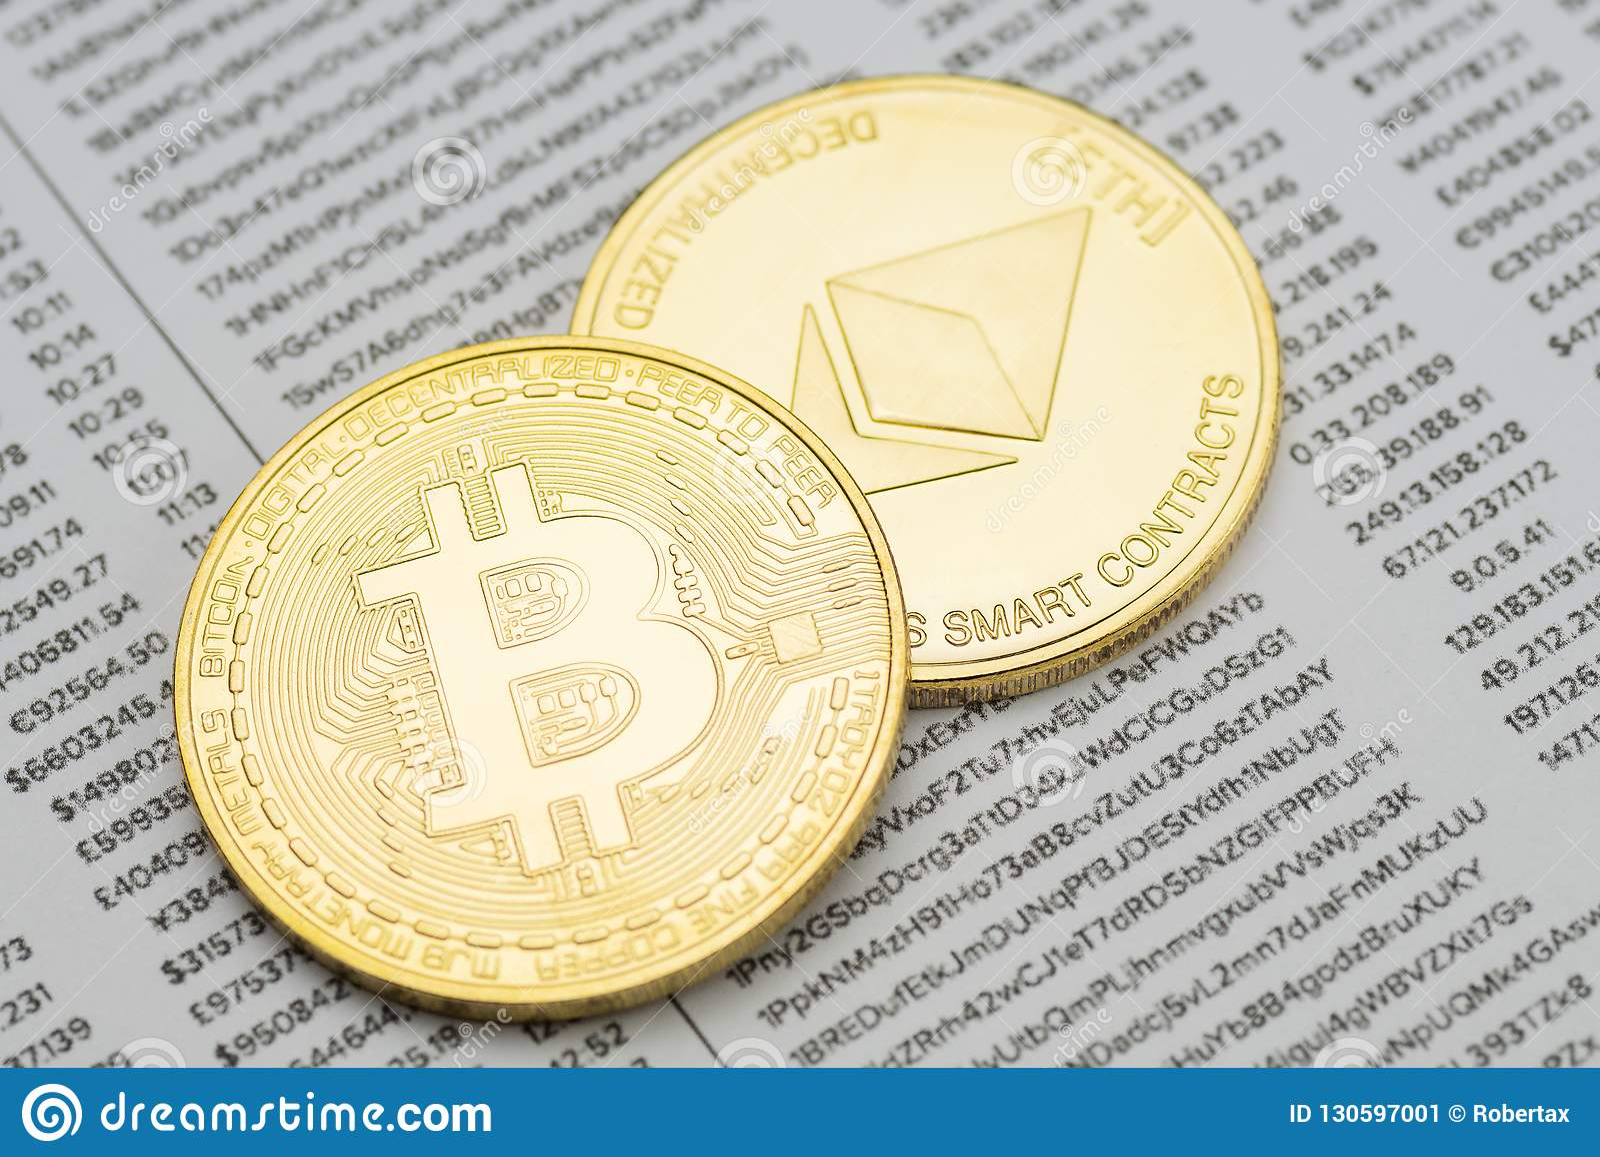 Kolekcinė Bitcoin BTC moneta, 4 cm